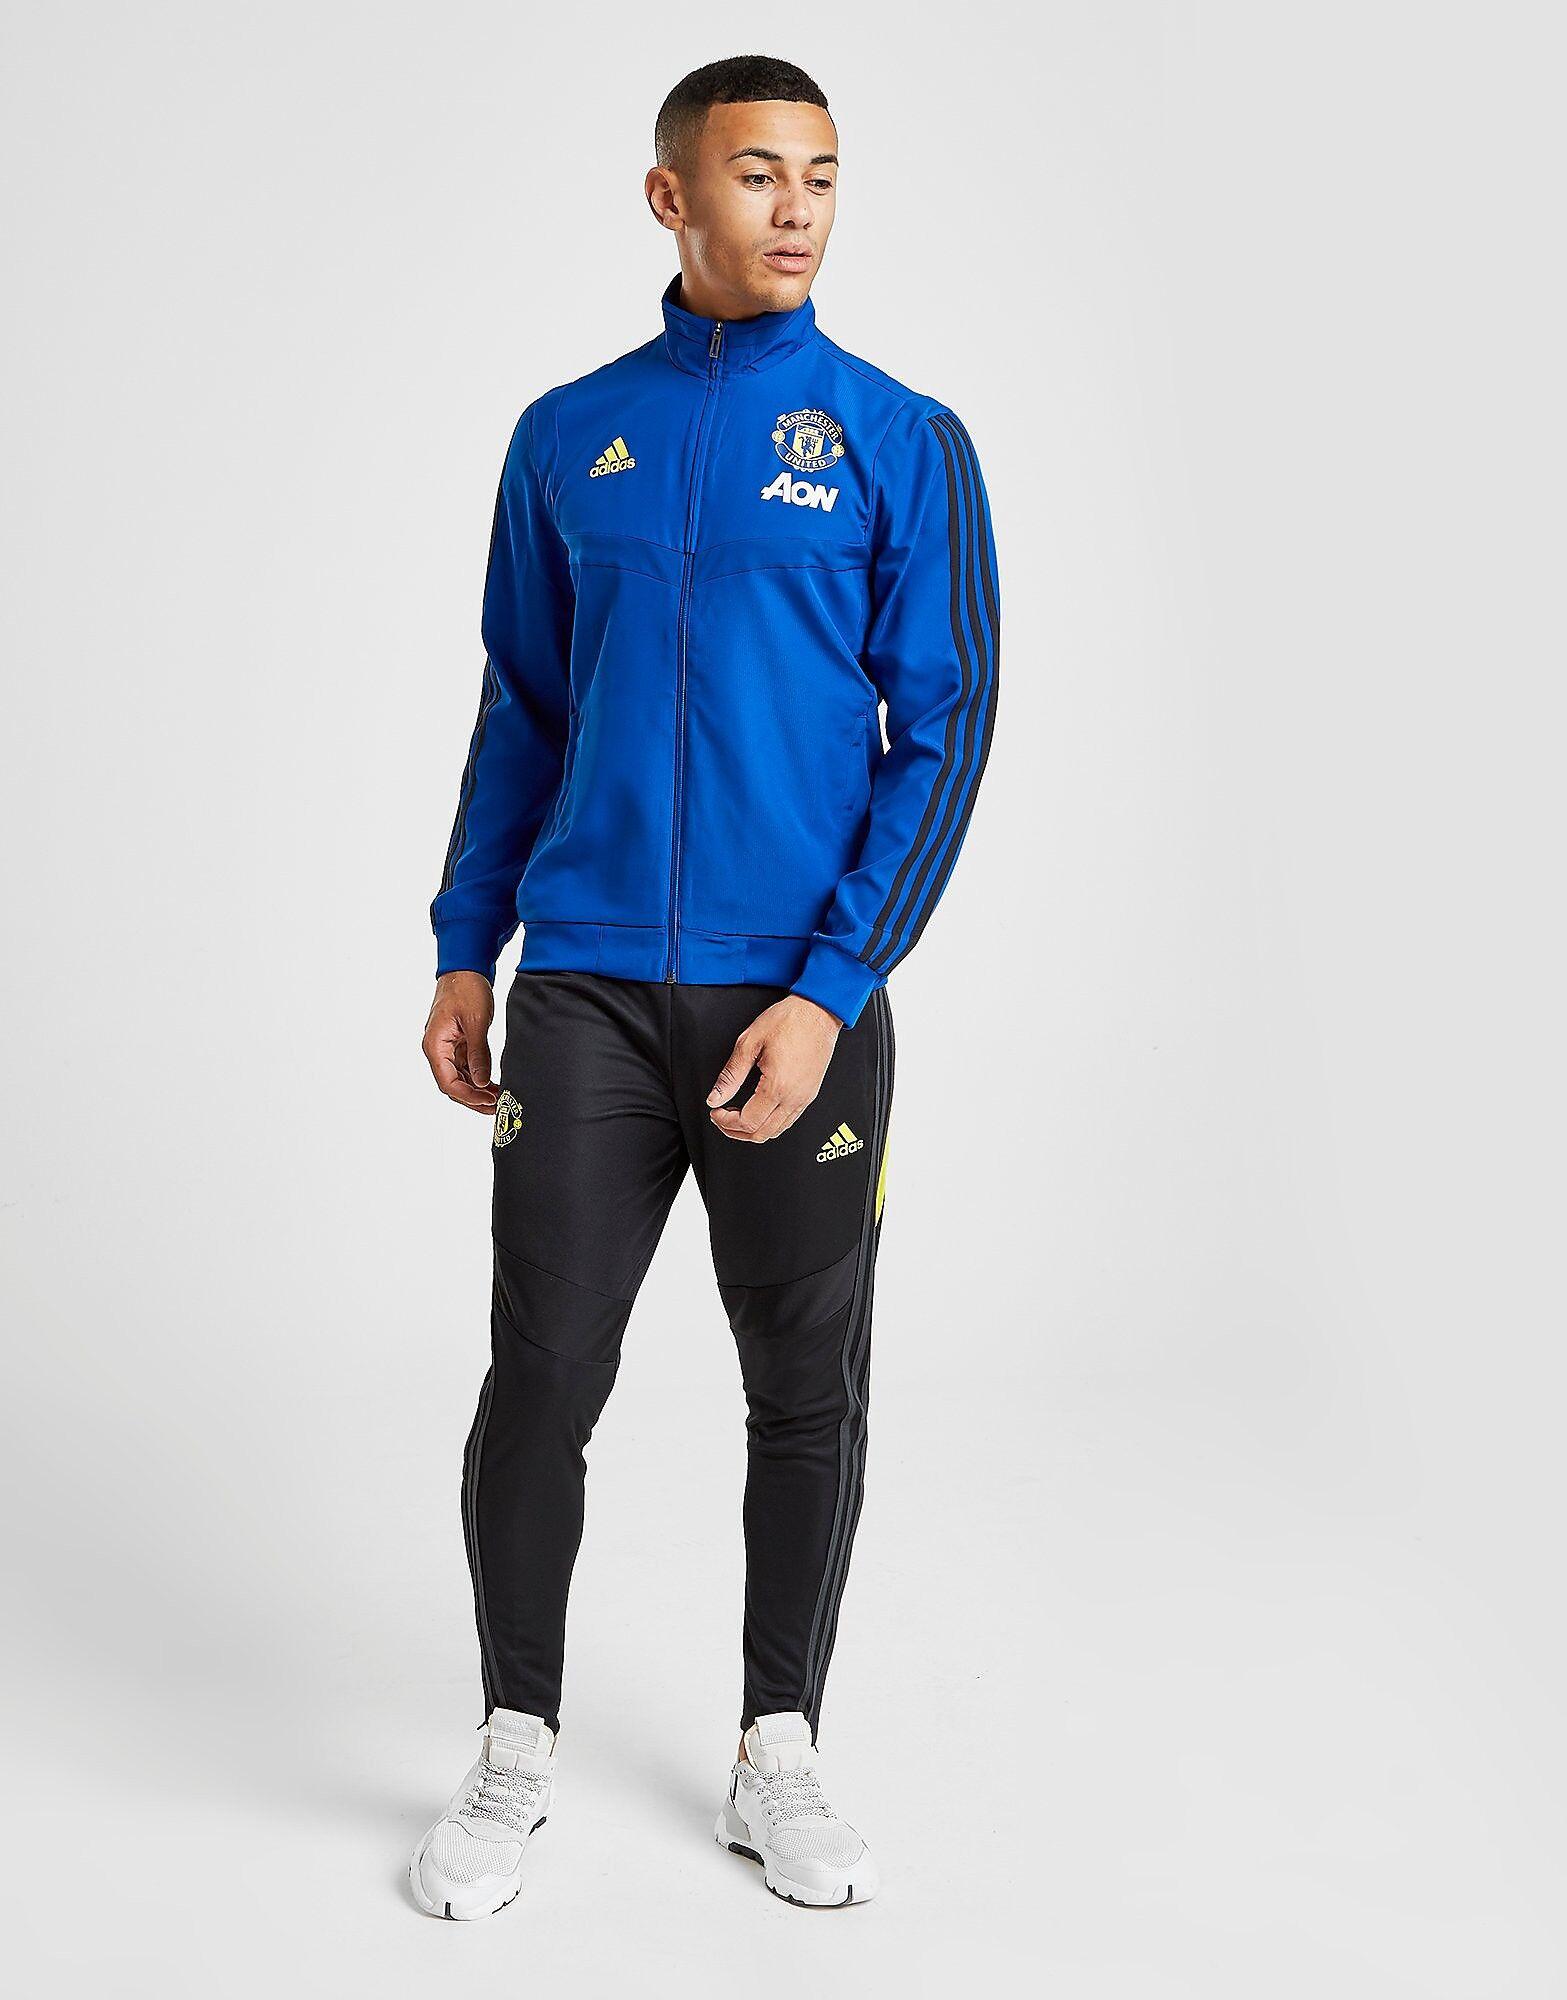 Image of Adidas Manchester United FC Treenihousut Miehet - Mens, Musta